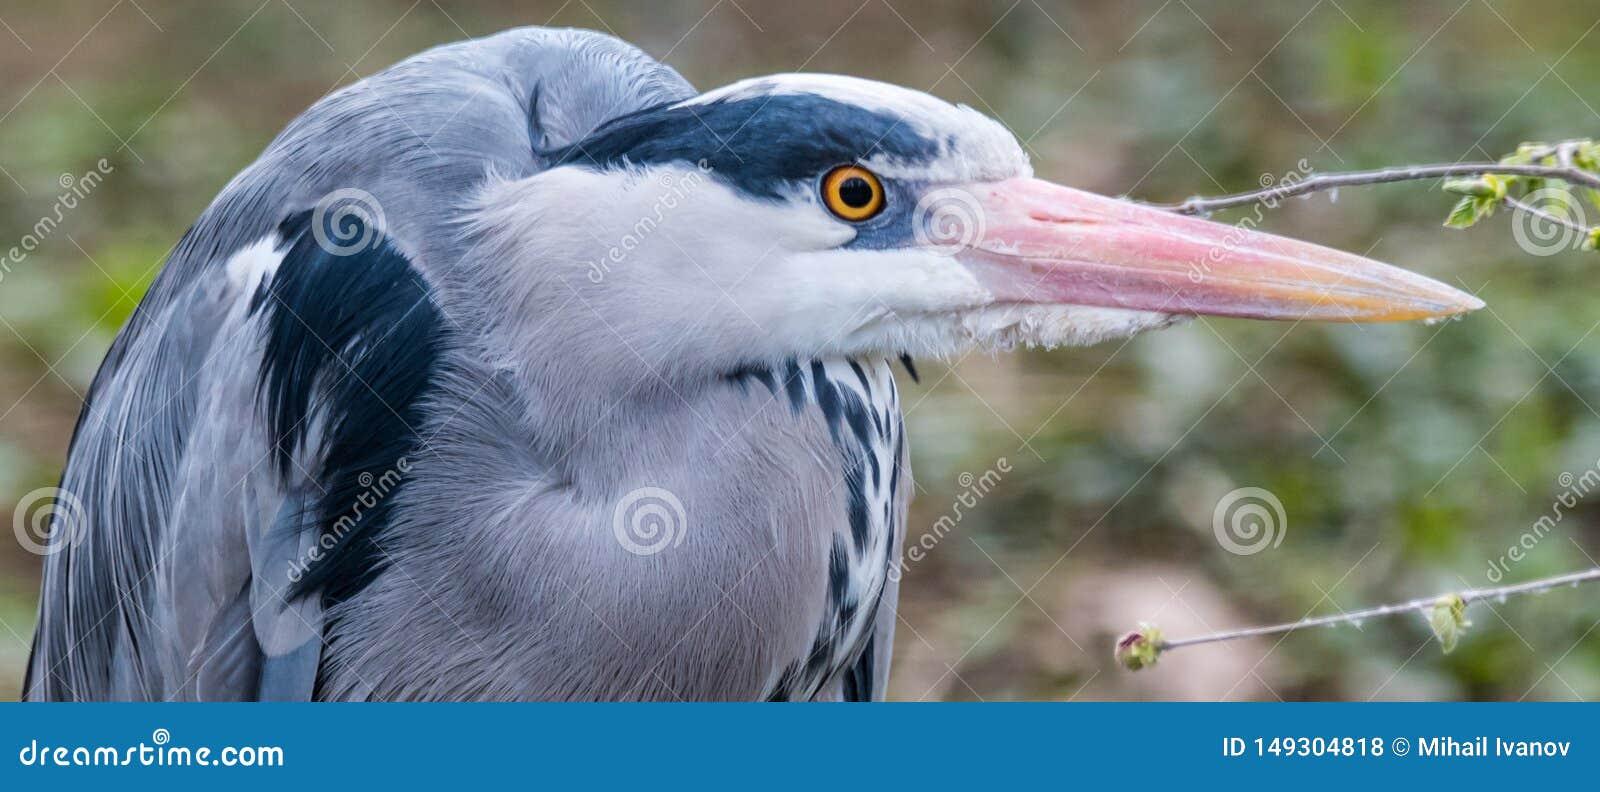 Grey heron portrait close up